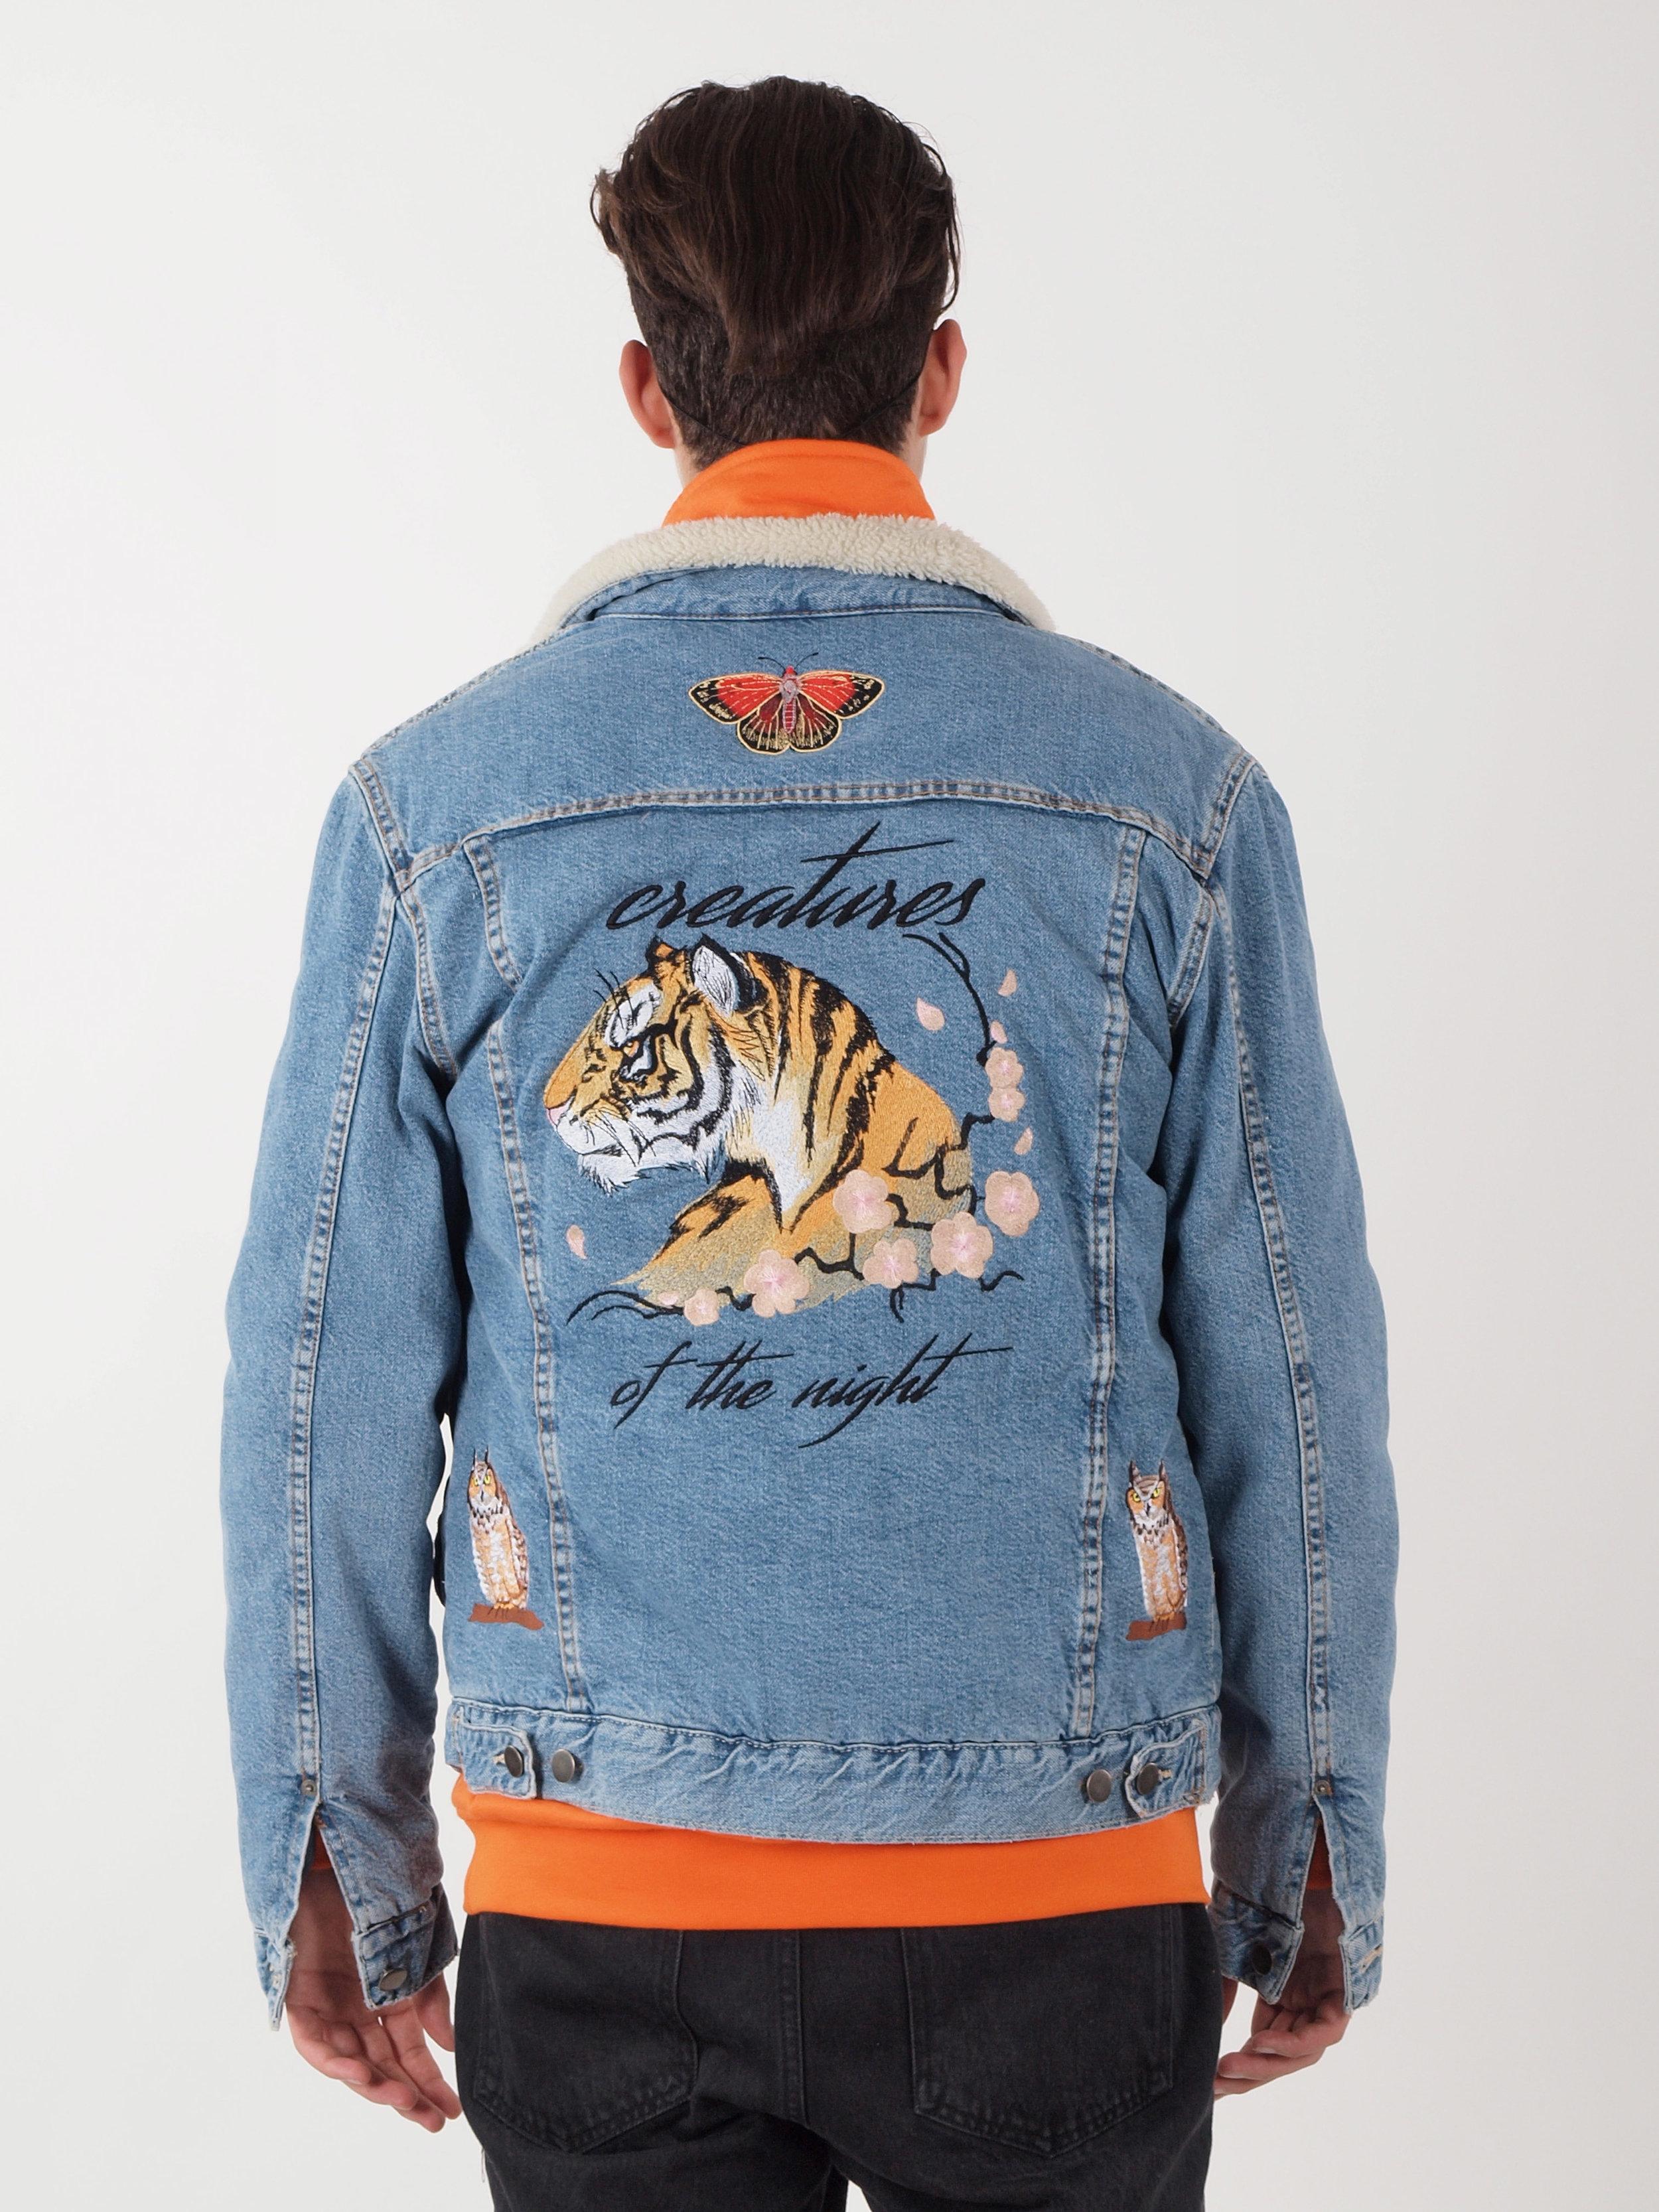 shearling denim jacket back.jpg